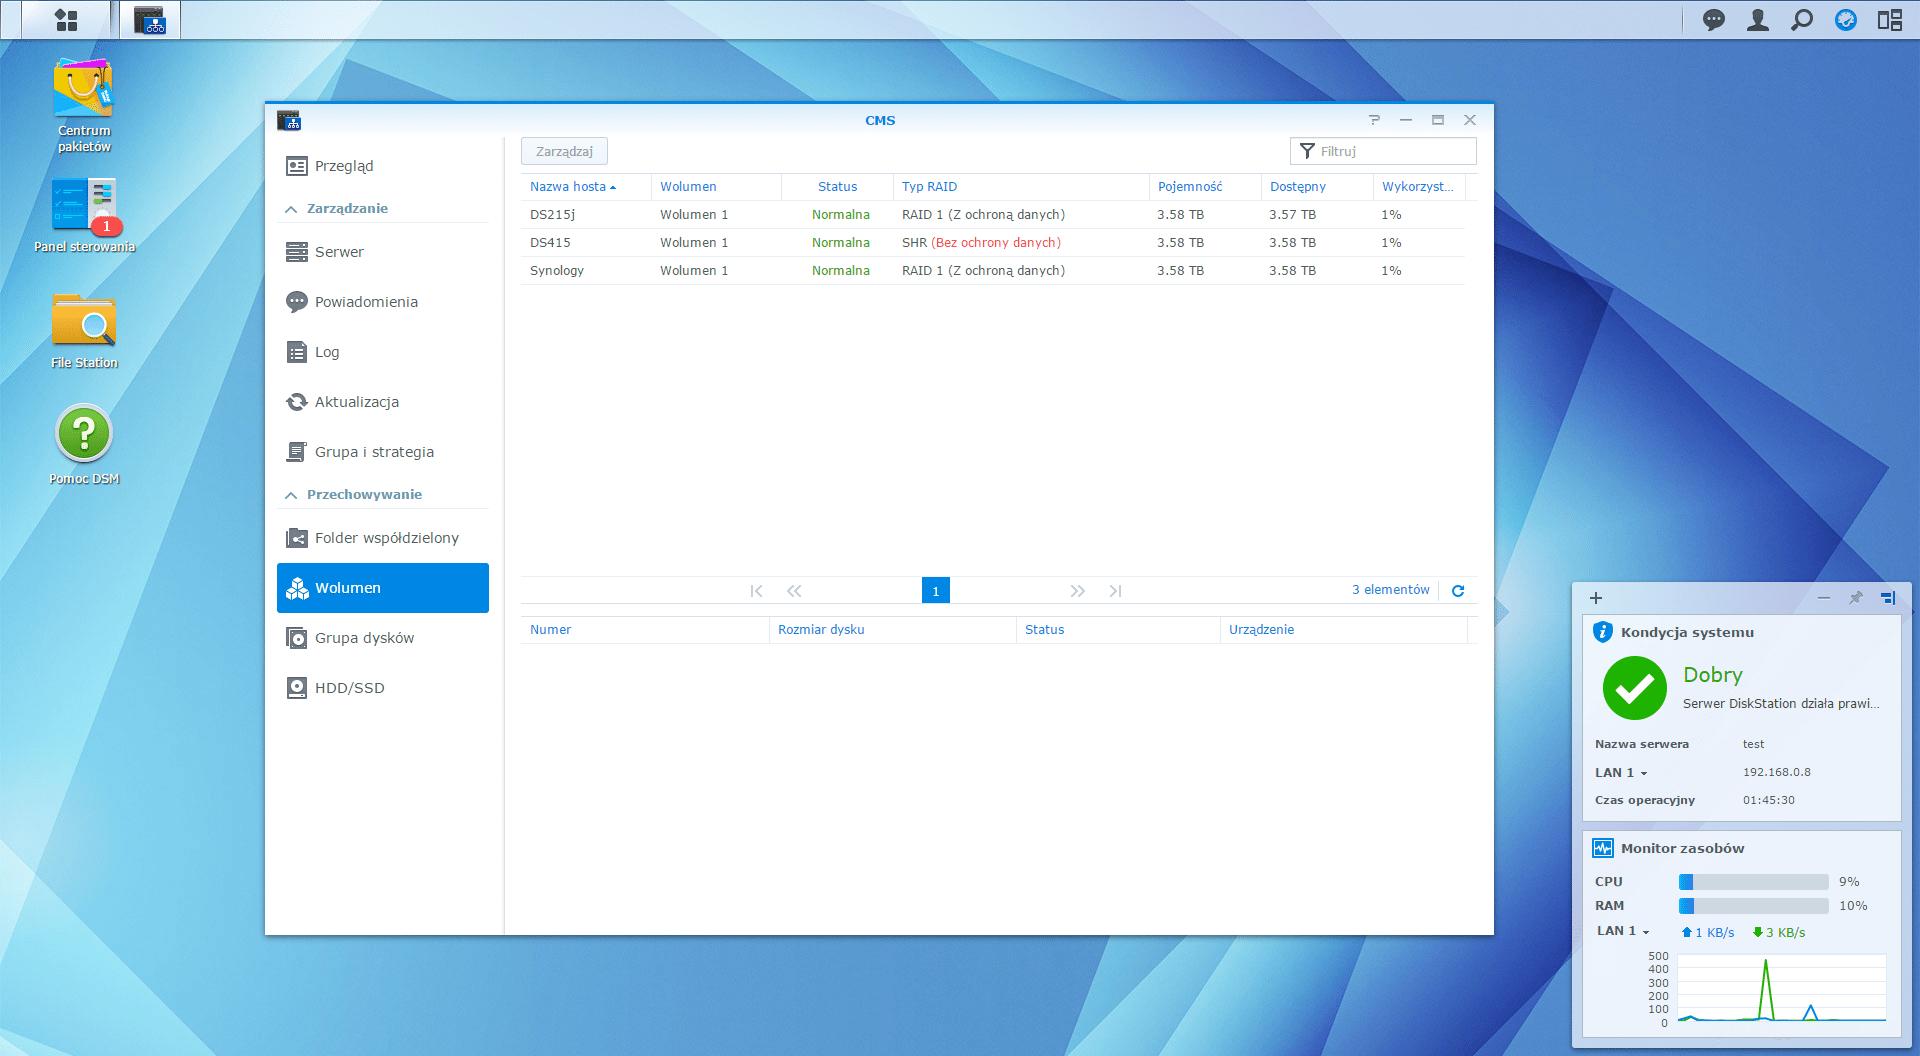 Synology DiskStation Manager